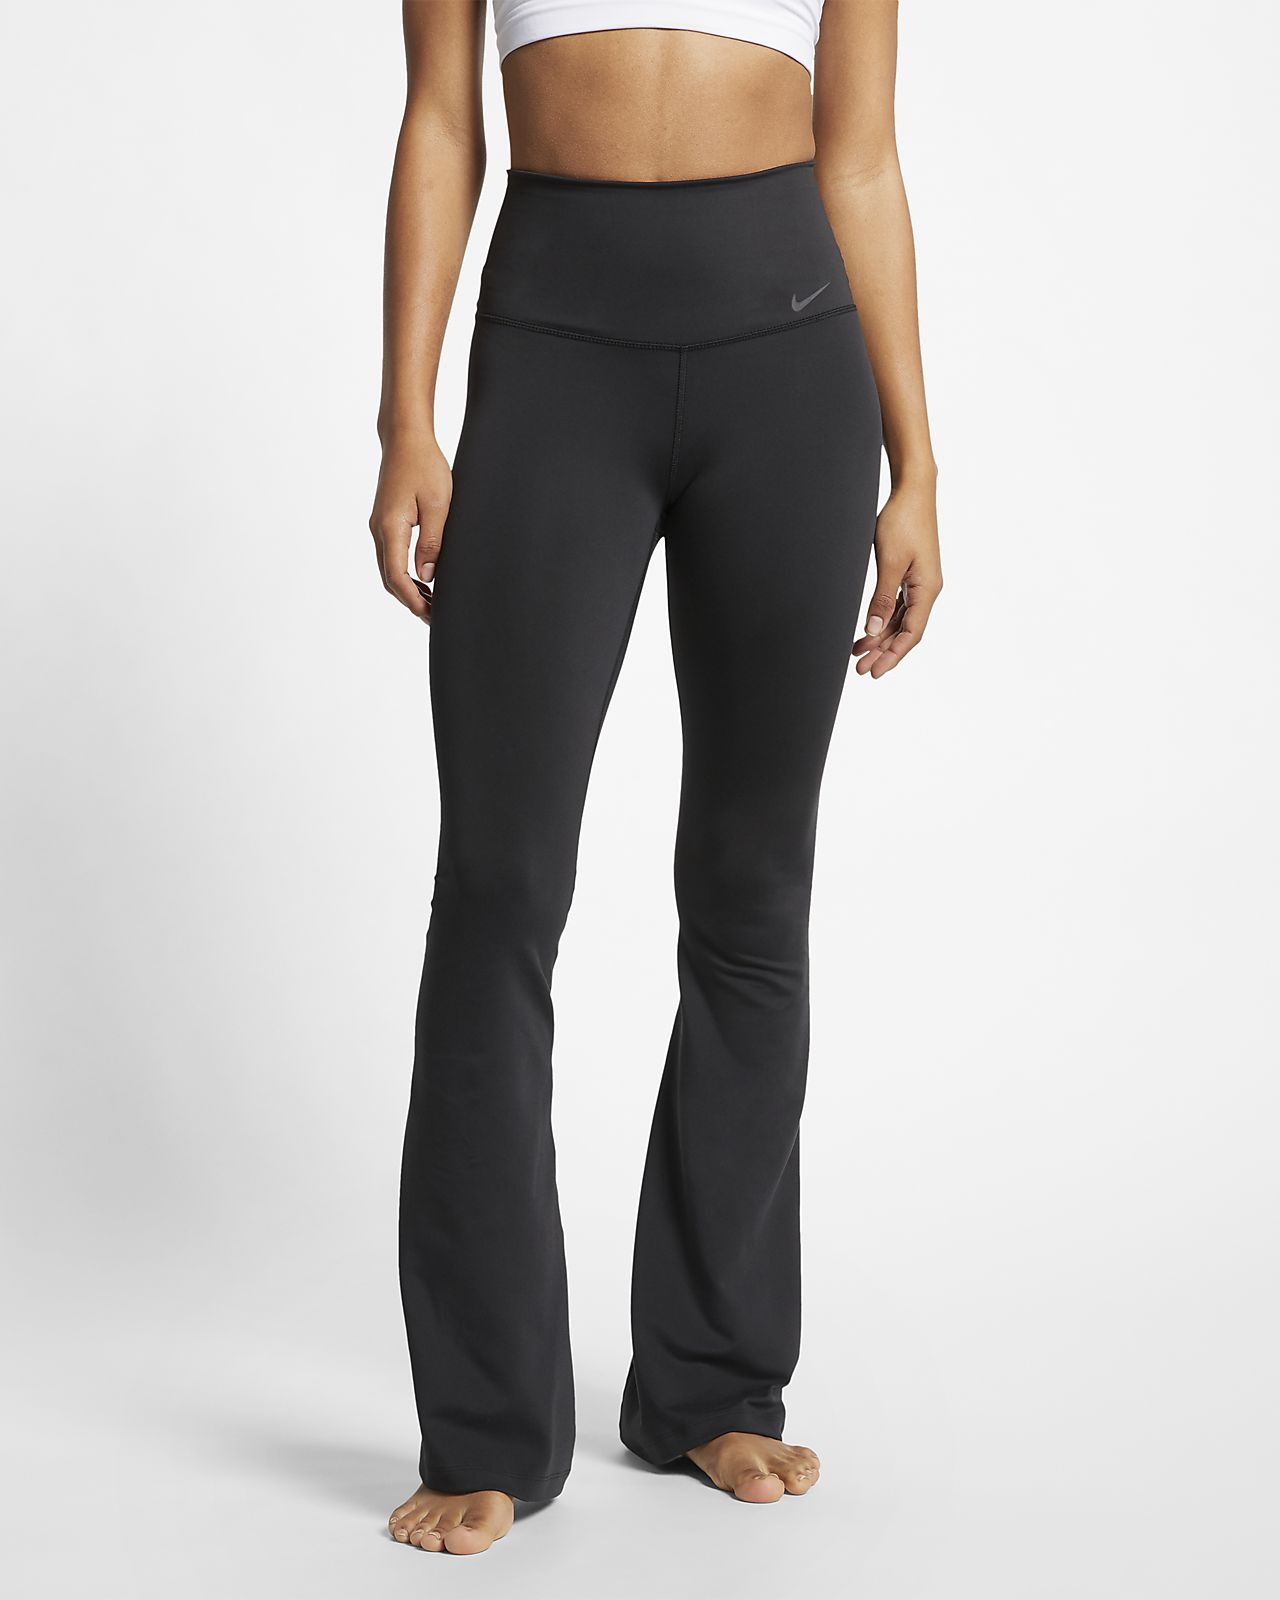 Nike Power Dri FIT Trainings Tights für Damen